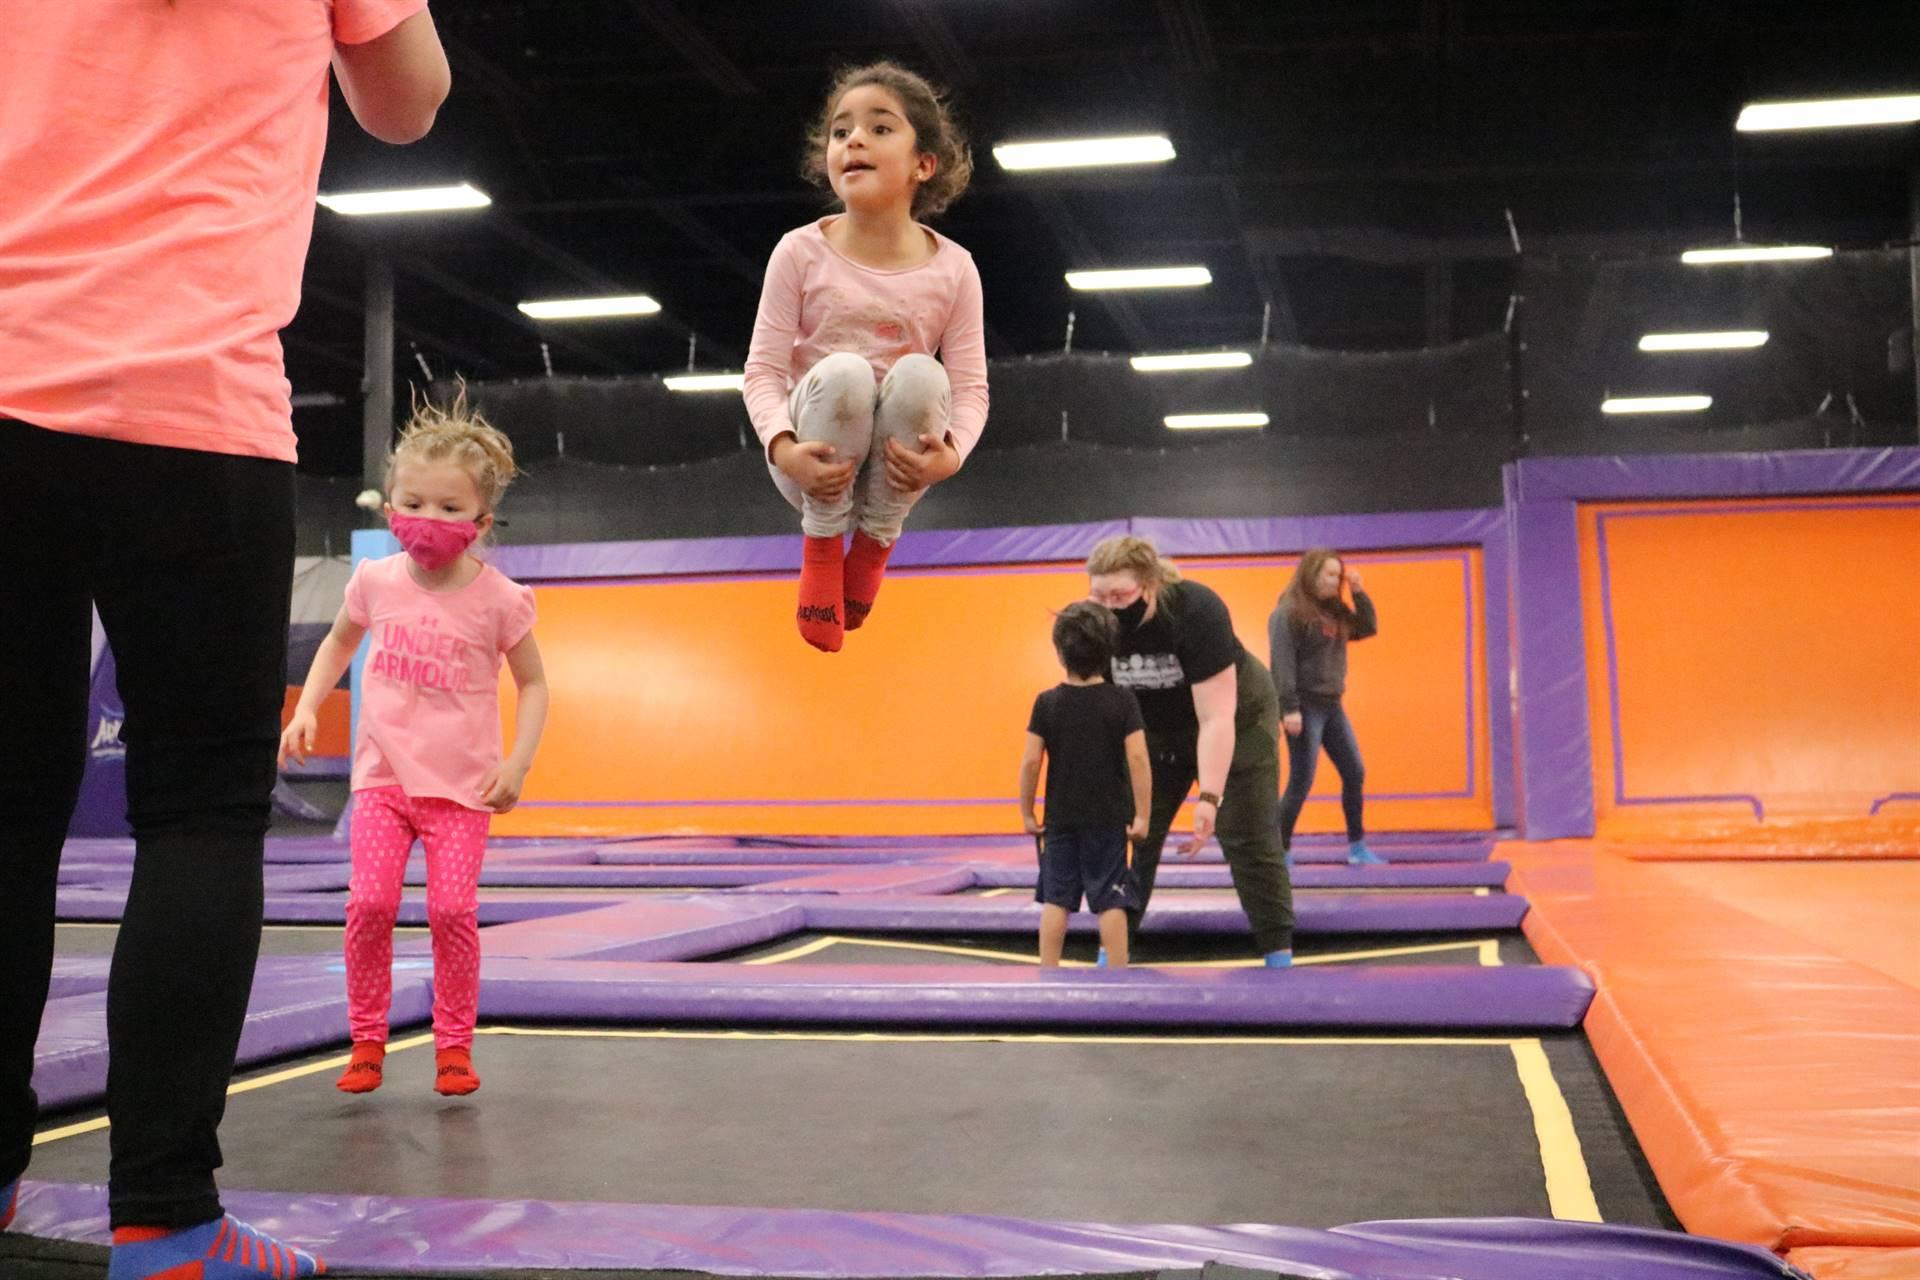 2 girls jumping